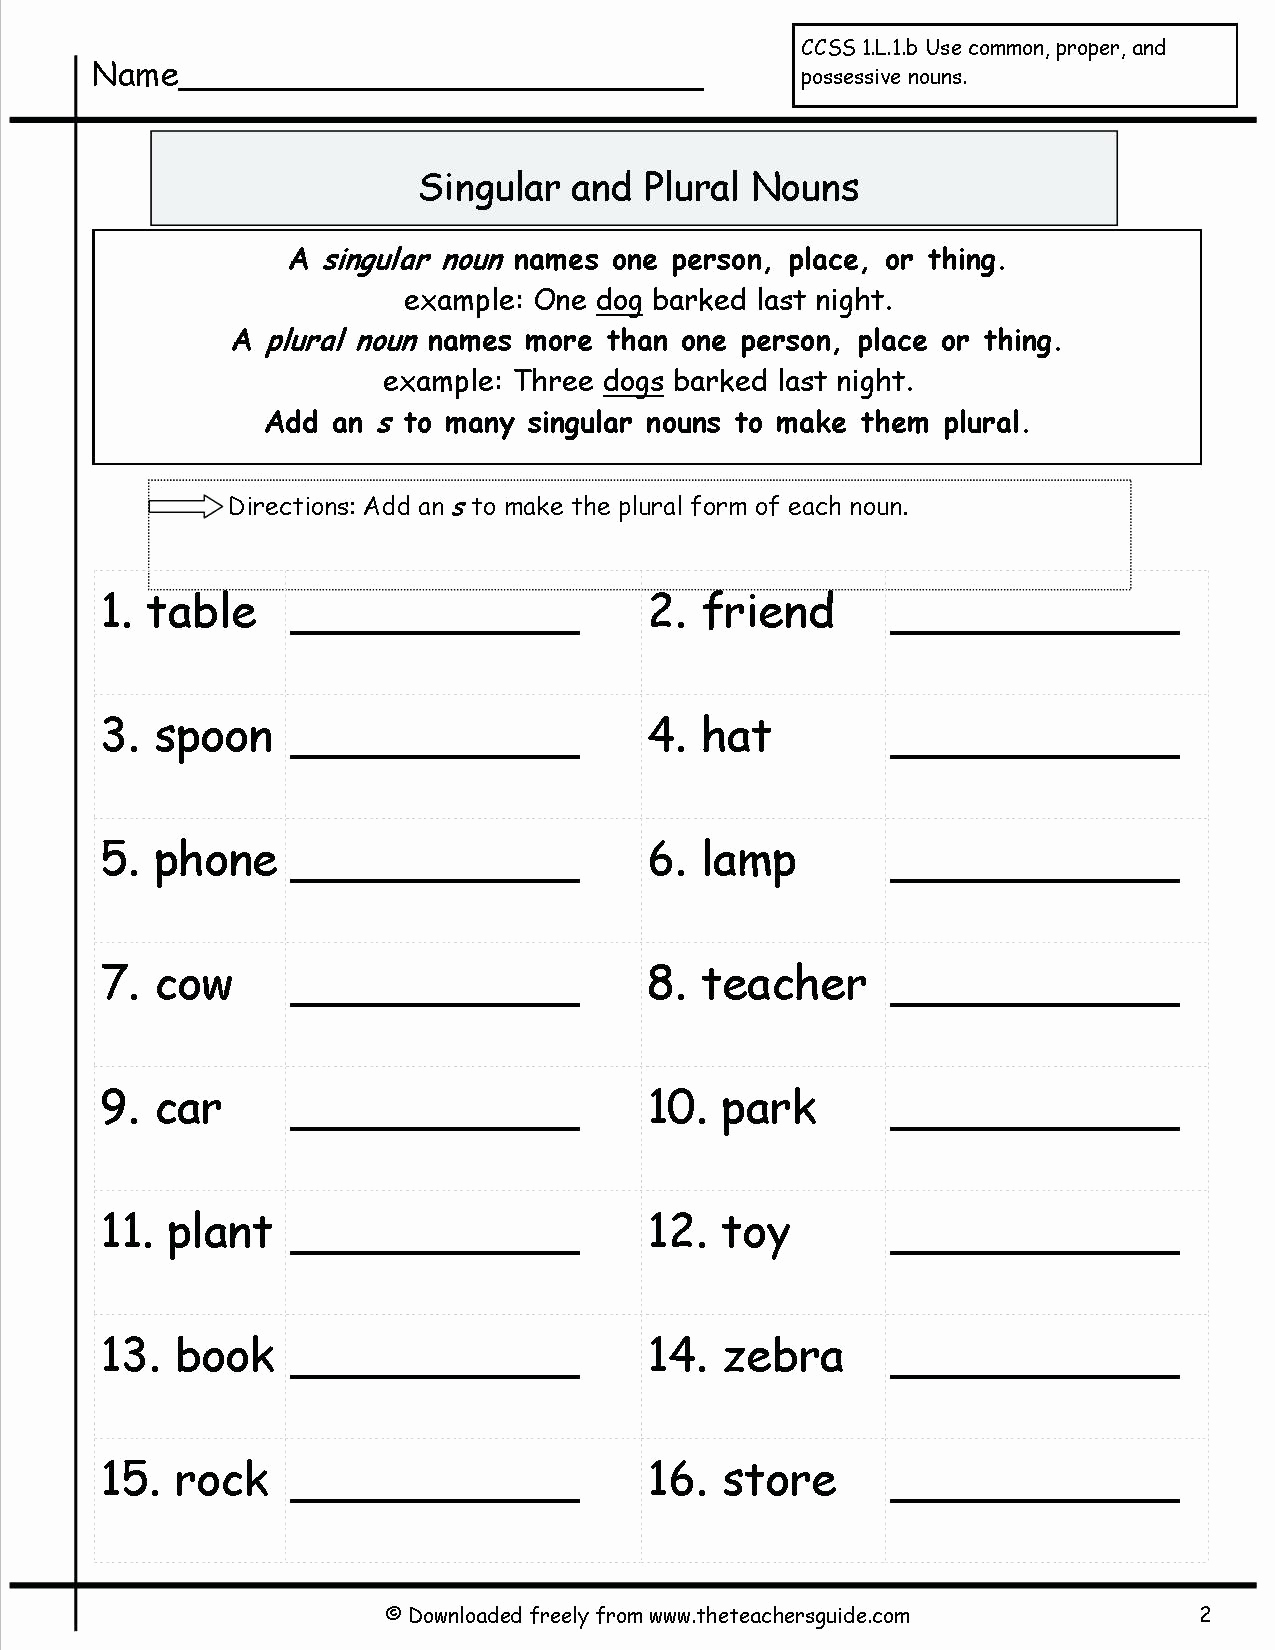 Possessive Pronouns Worksheet 2nd Grade Inspirational 20 Possessive Nouns Worksheet 2nd Grade